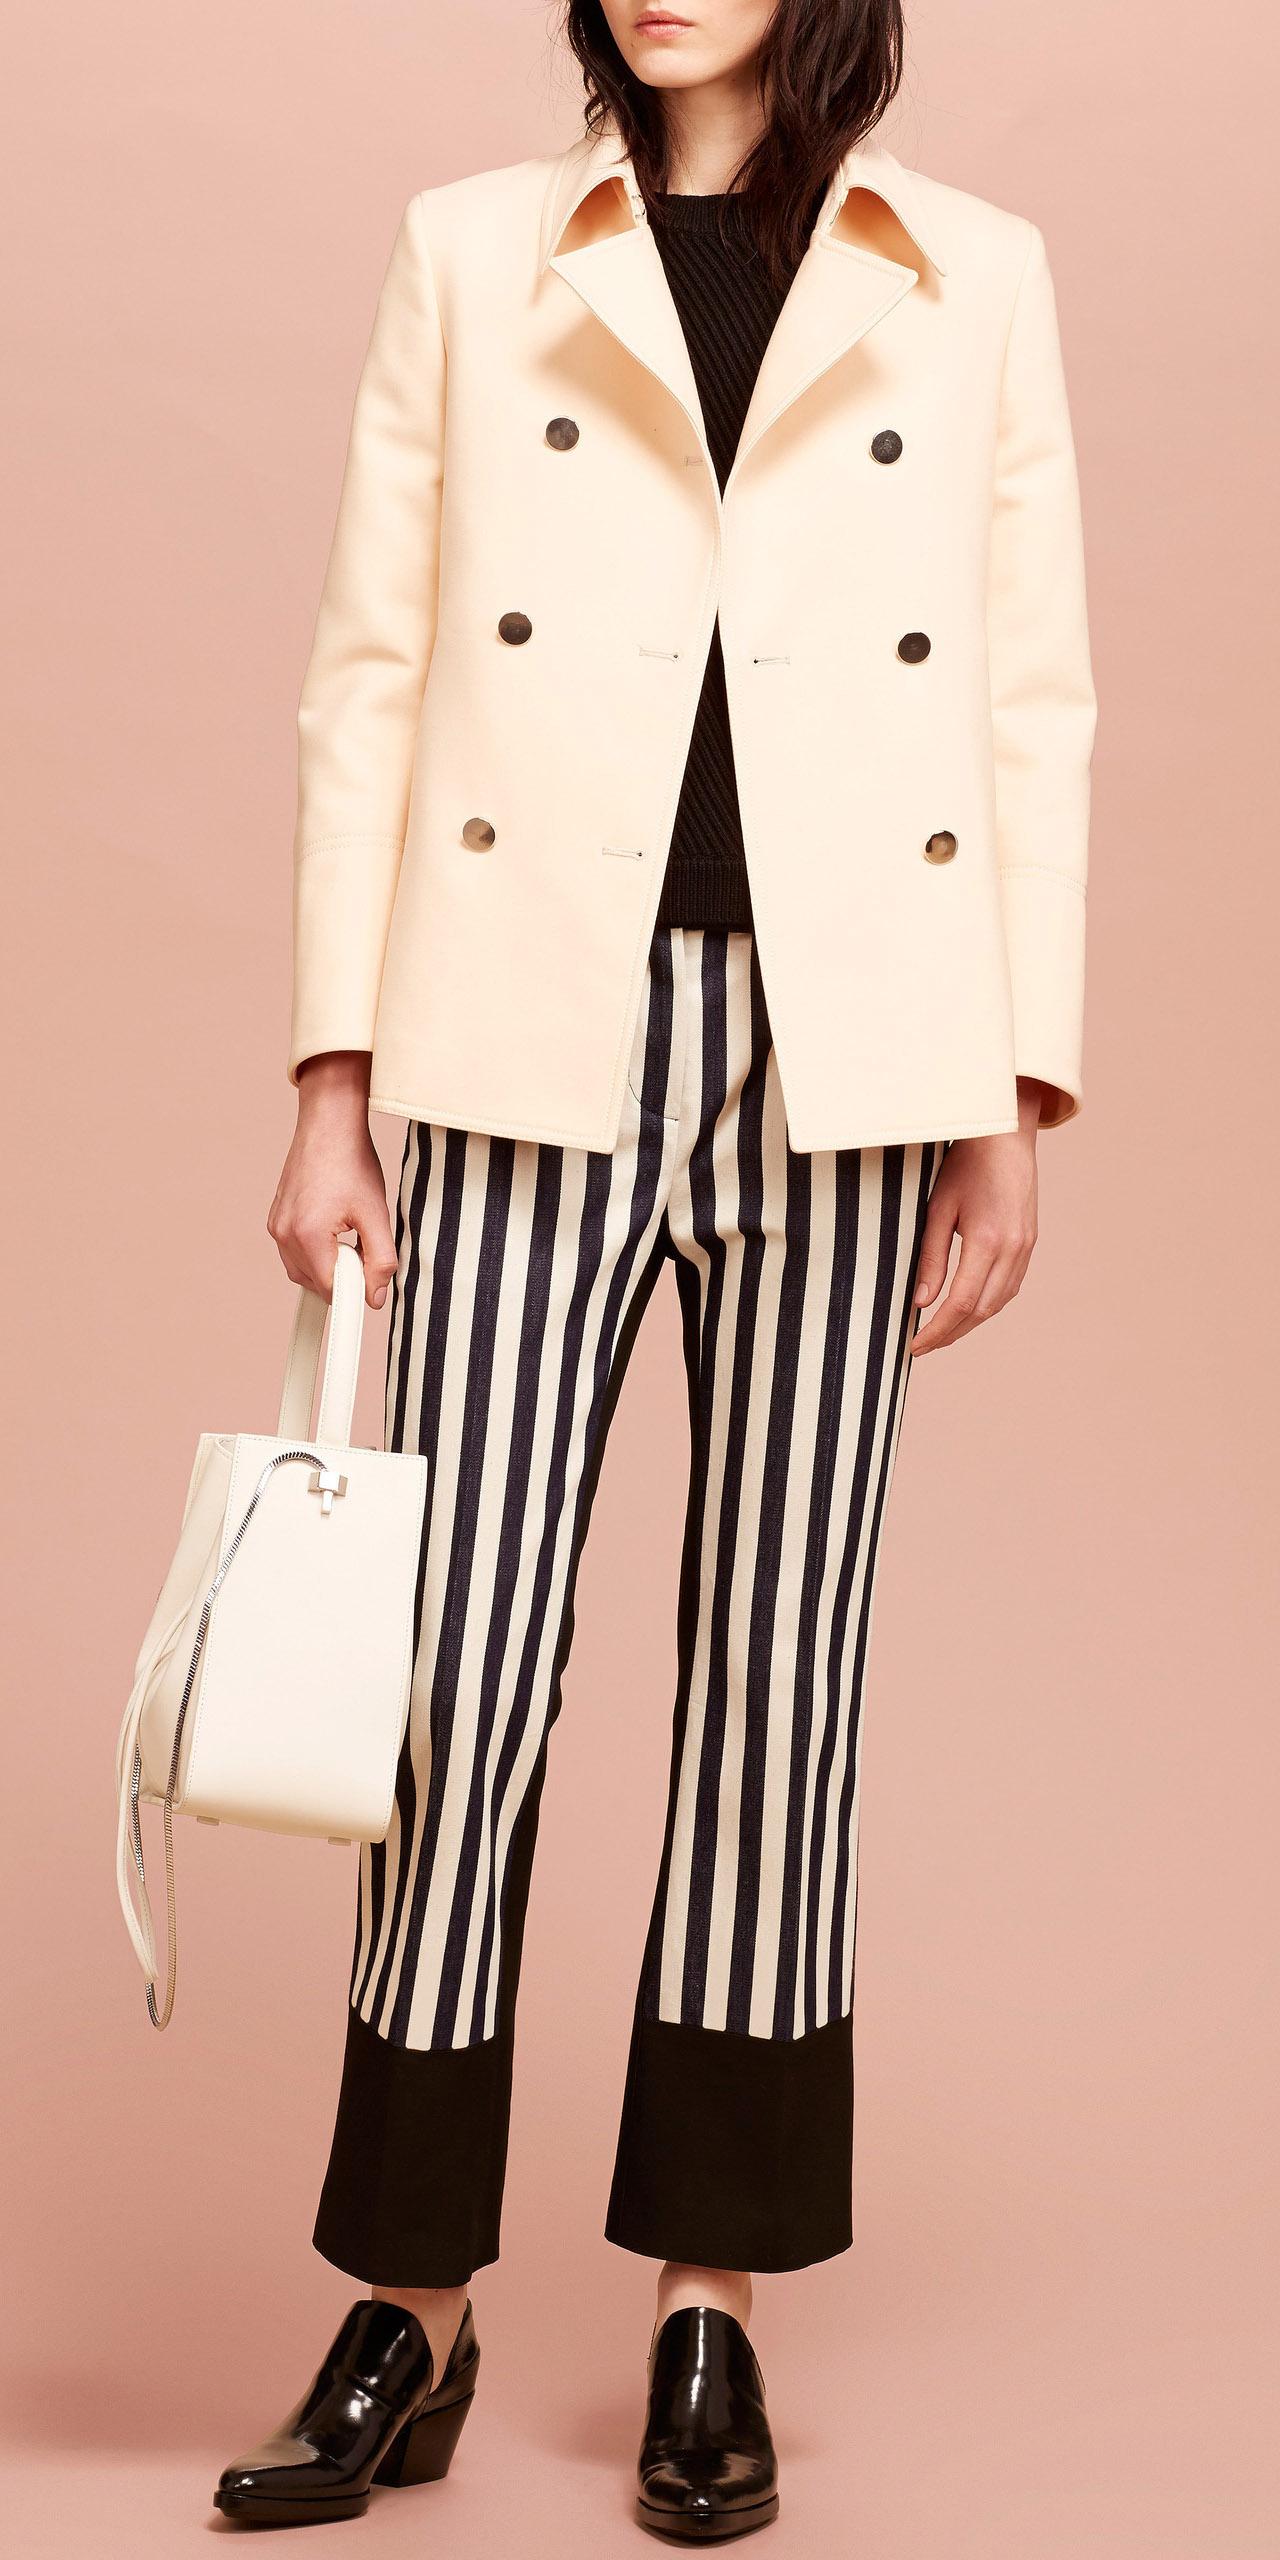 white-wideleg-pants-vertical-stripe-white-bag-black-sweater-black-shoe-loafers-white-jacket-coat-peacoat-fall-winter-lunch.jpg